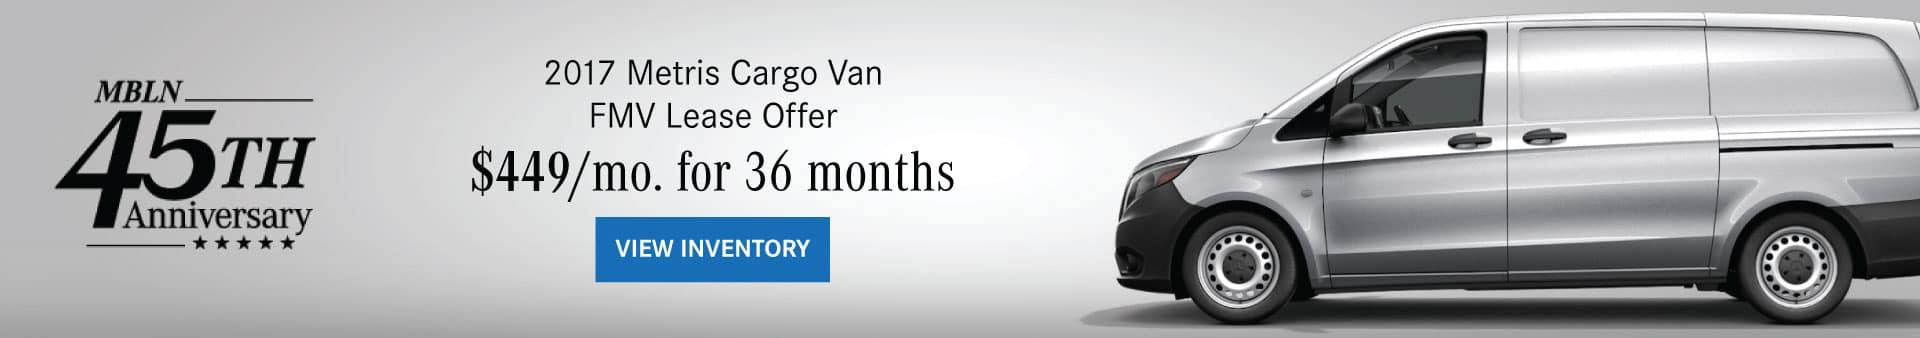 Mercedes benz vans national offers mercedes benz of for Laguna niguel mercedes benz dealer